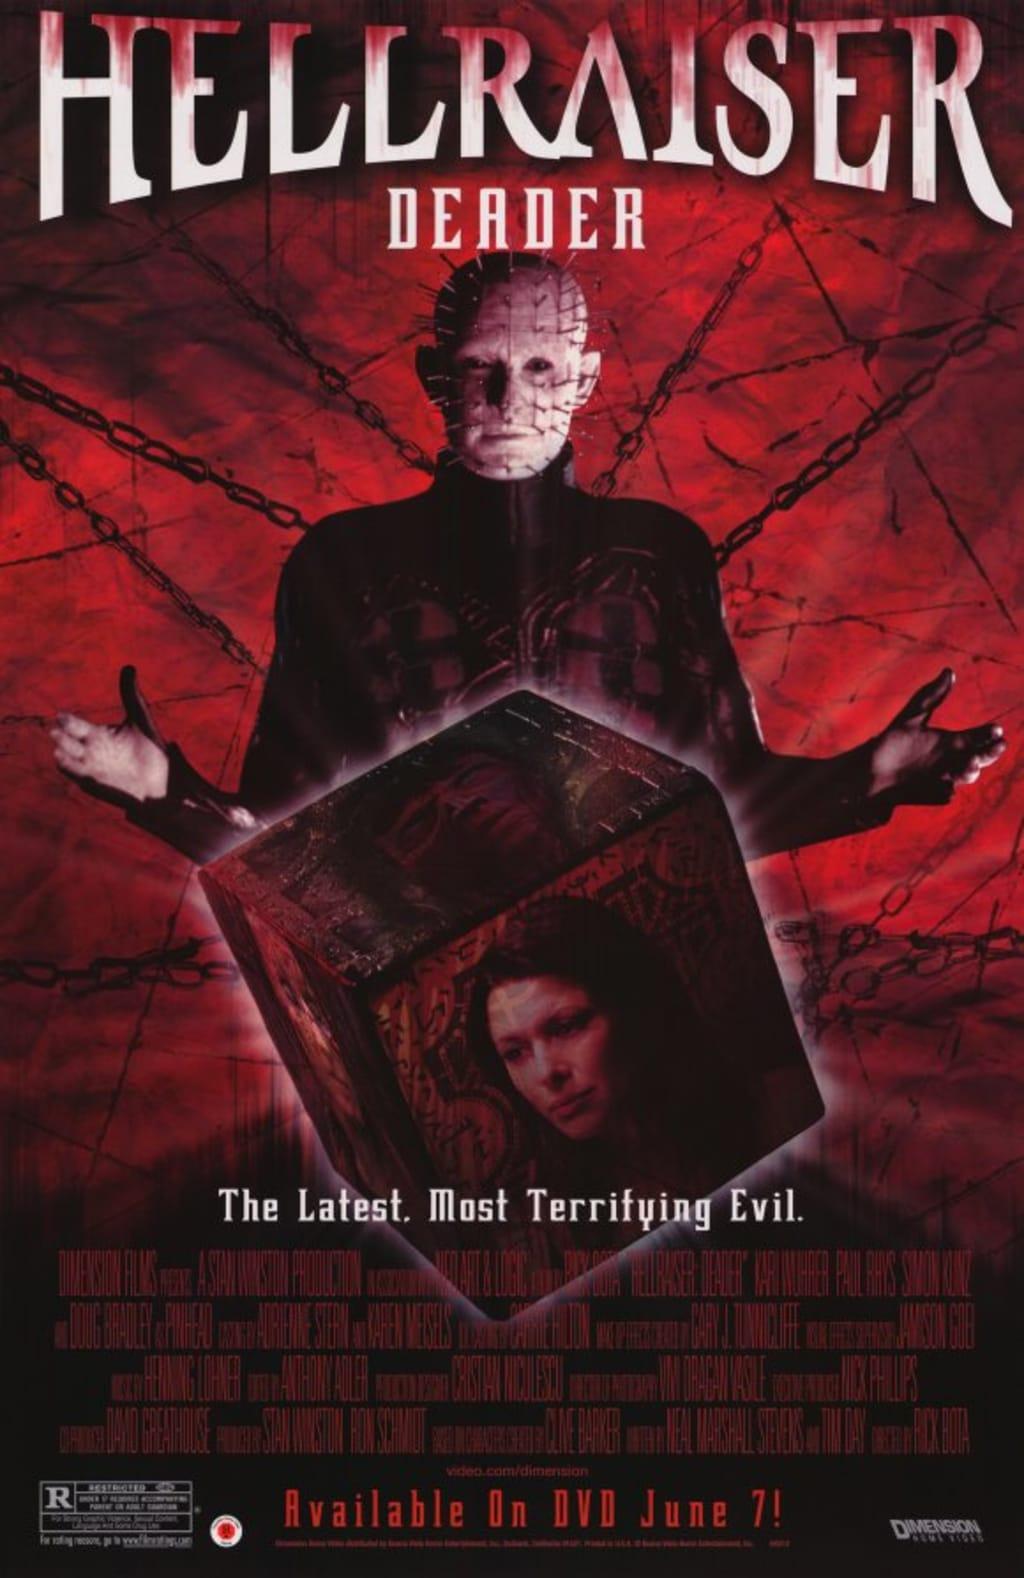 Reed Alexander's Horror Review of 'Hellraiser: Deader' (2005)